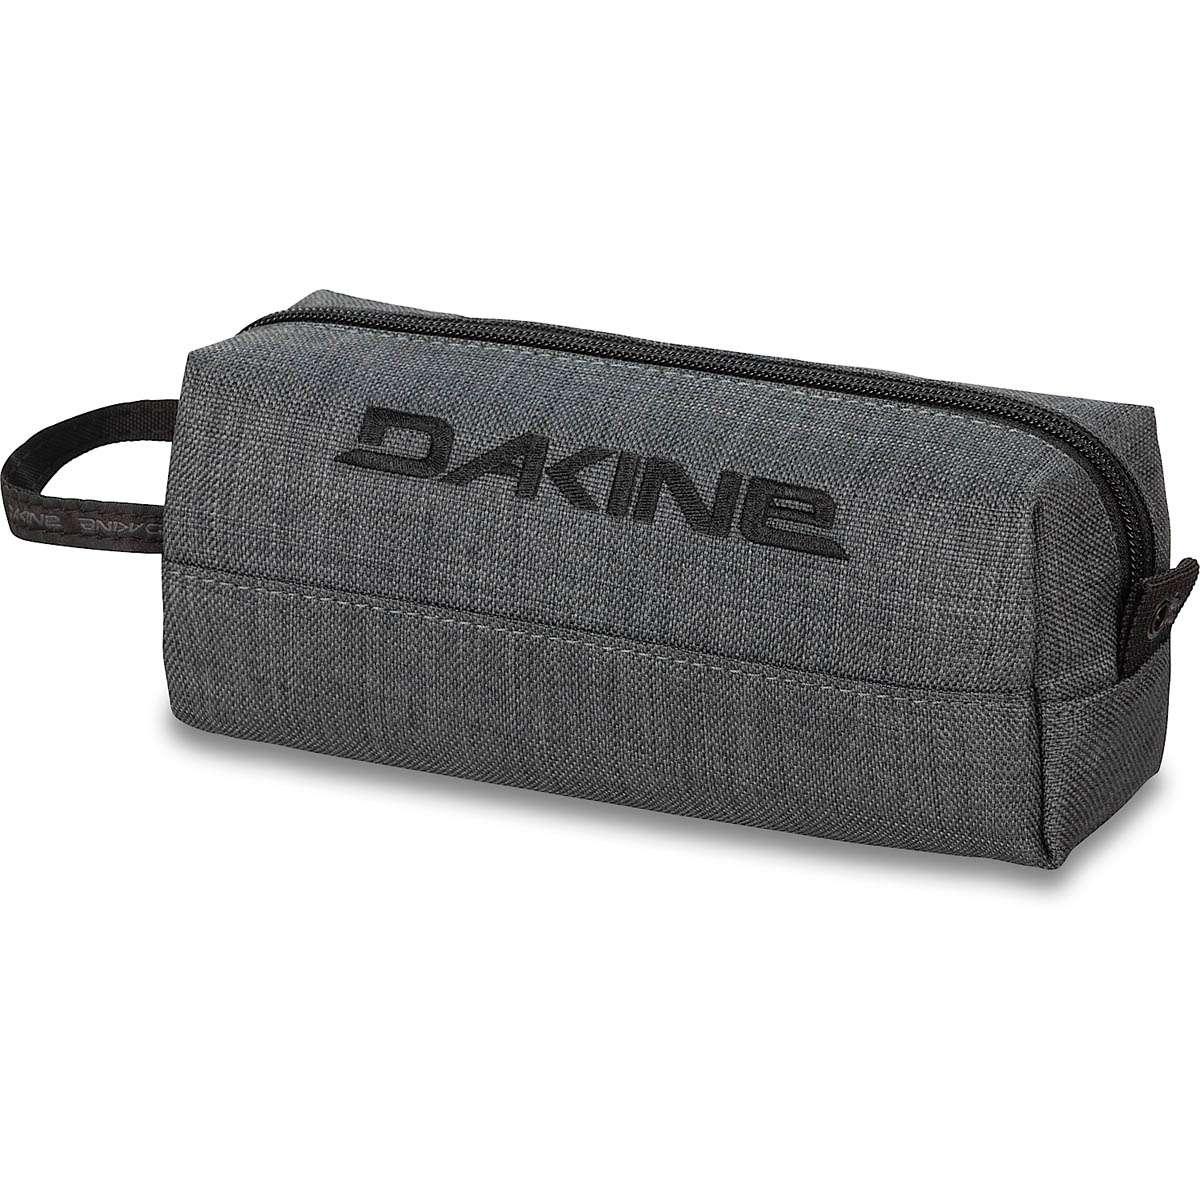 d470cd0e8f897 Dakine Accessory Case Pencil Case Carbon